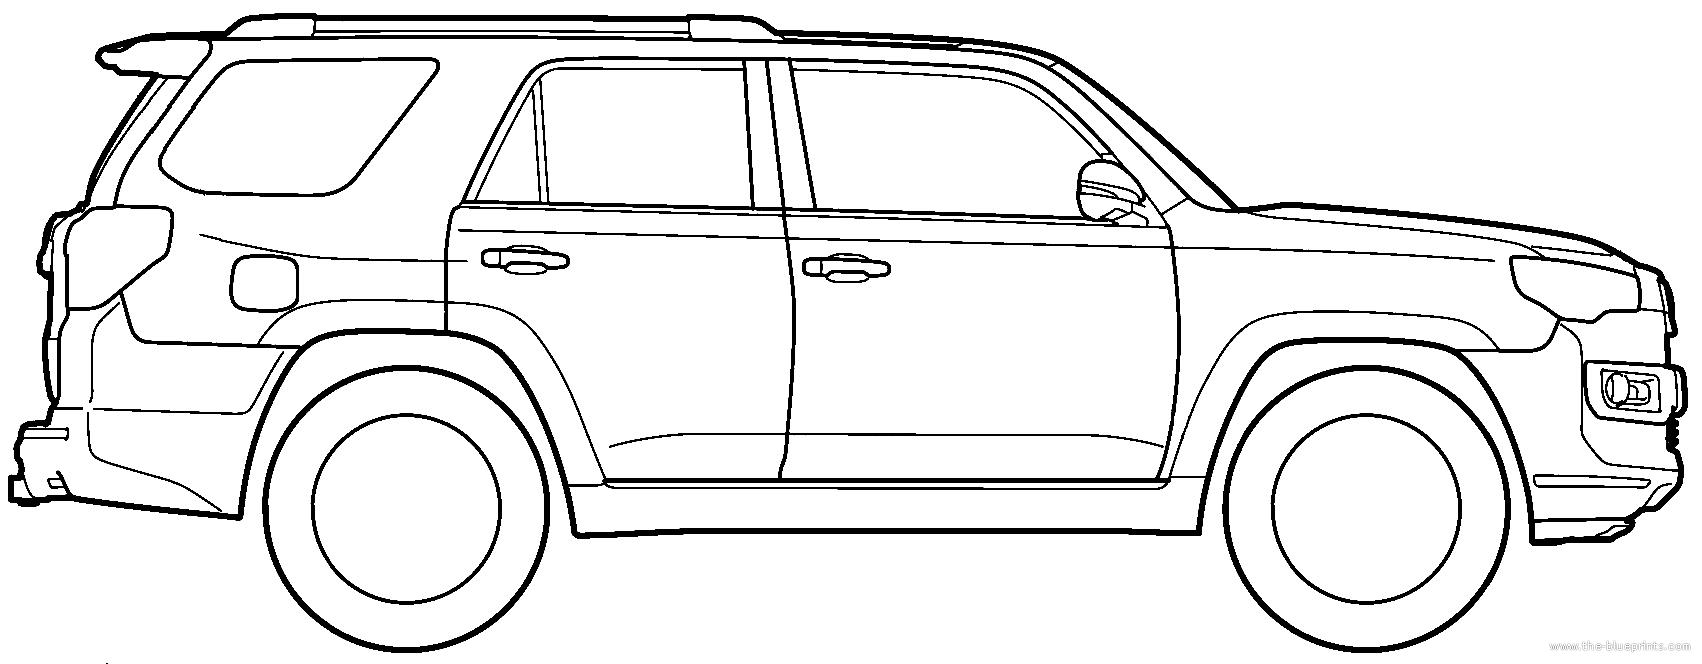 blueprints  u0026gt  cars  u0026gt  toyota  u0026gt  toyota 4runner  2015